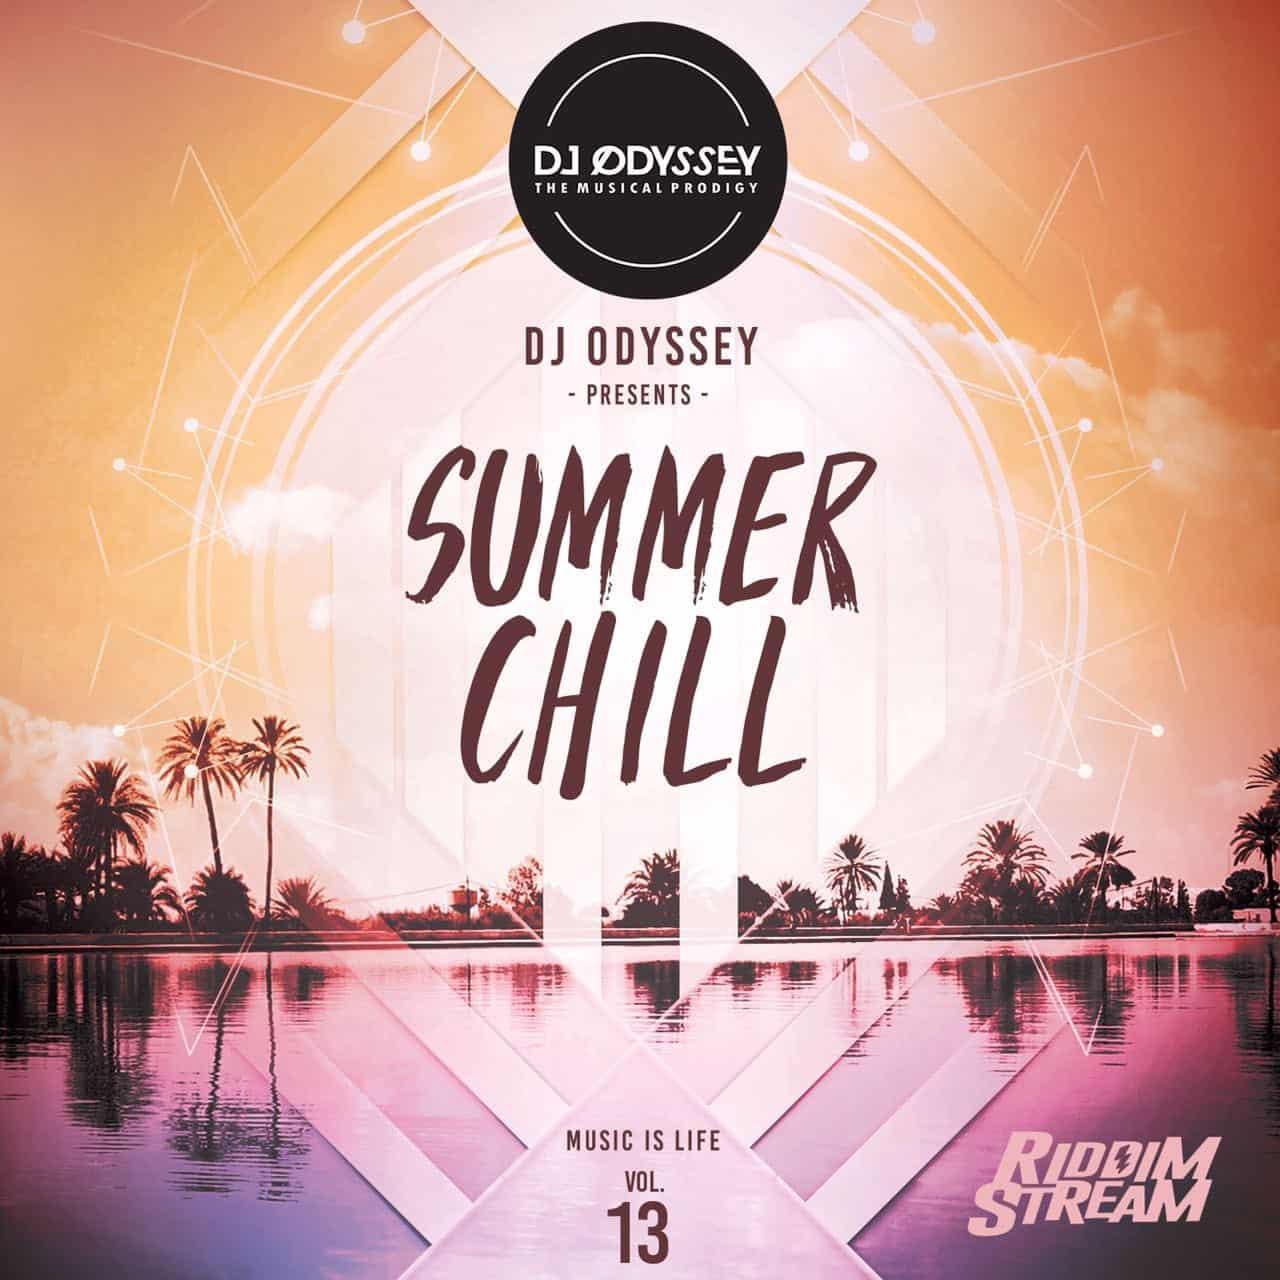 Dj Odyssey - Summer Chill - Music is Life Vol 13